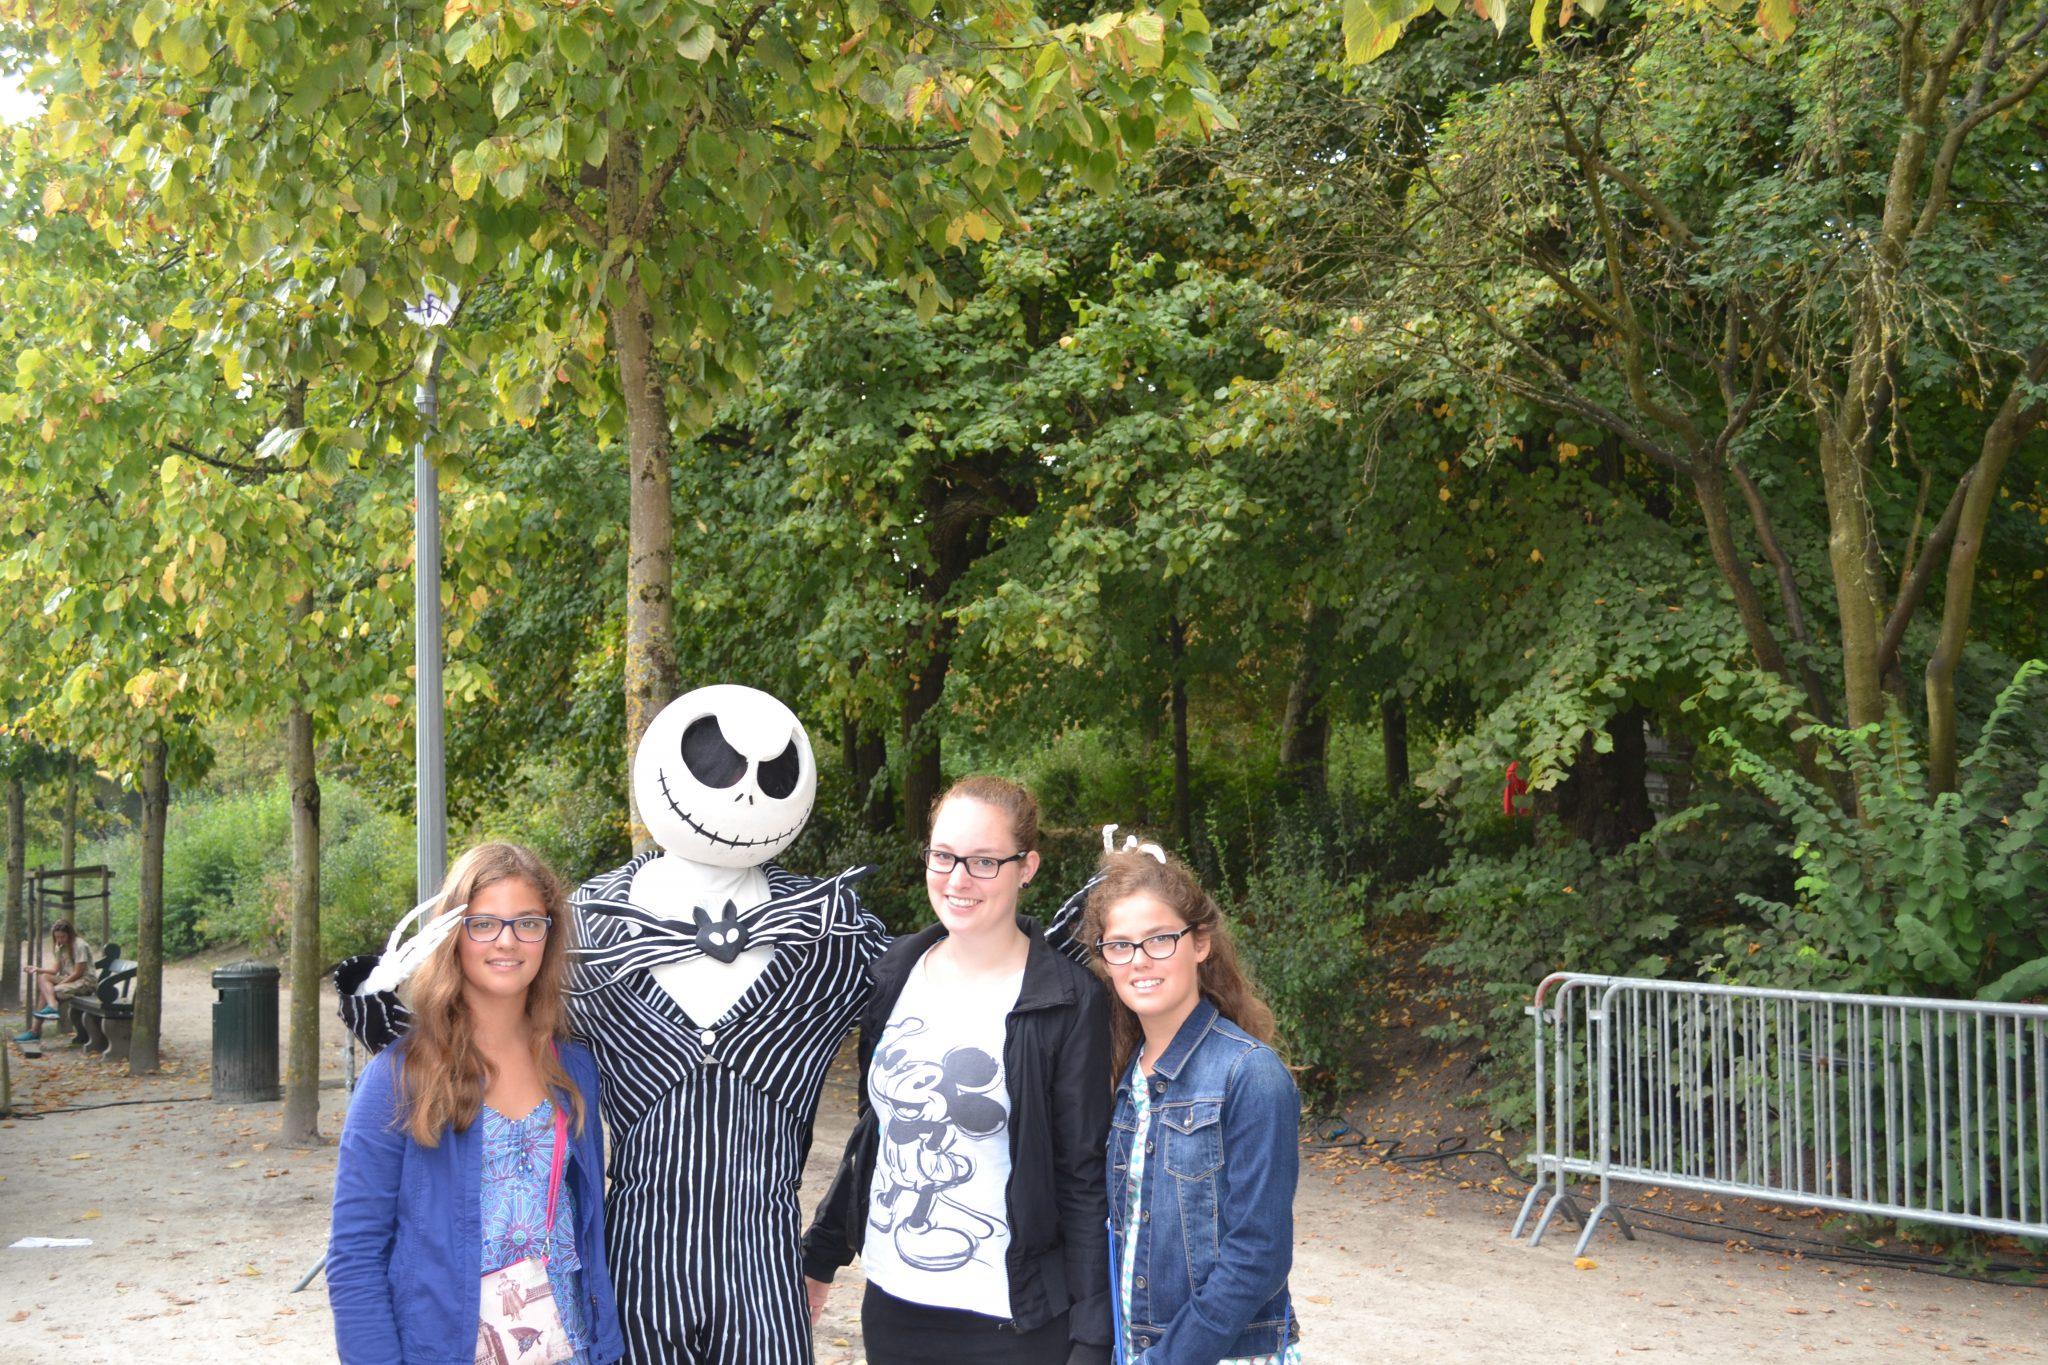 Comicfestival Brüssel - dsc 0002